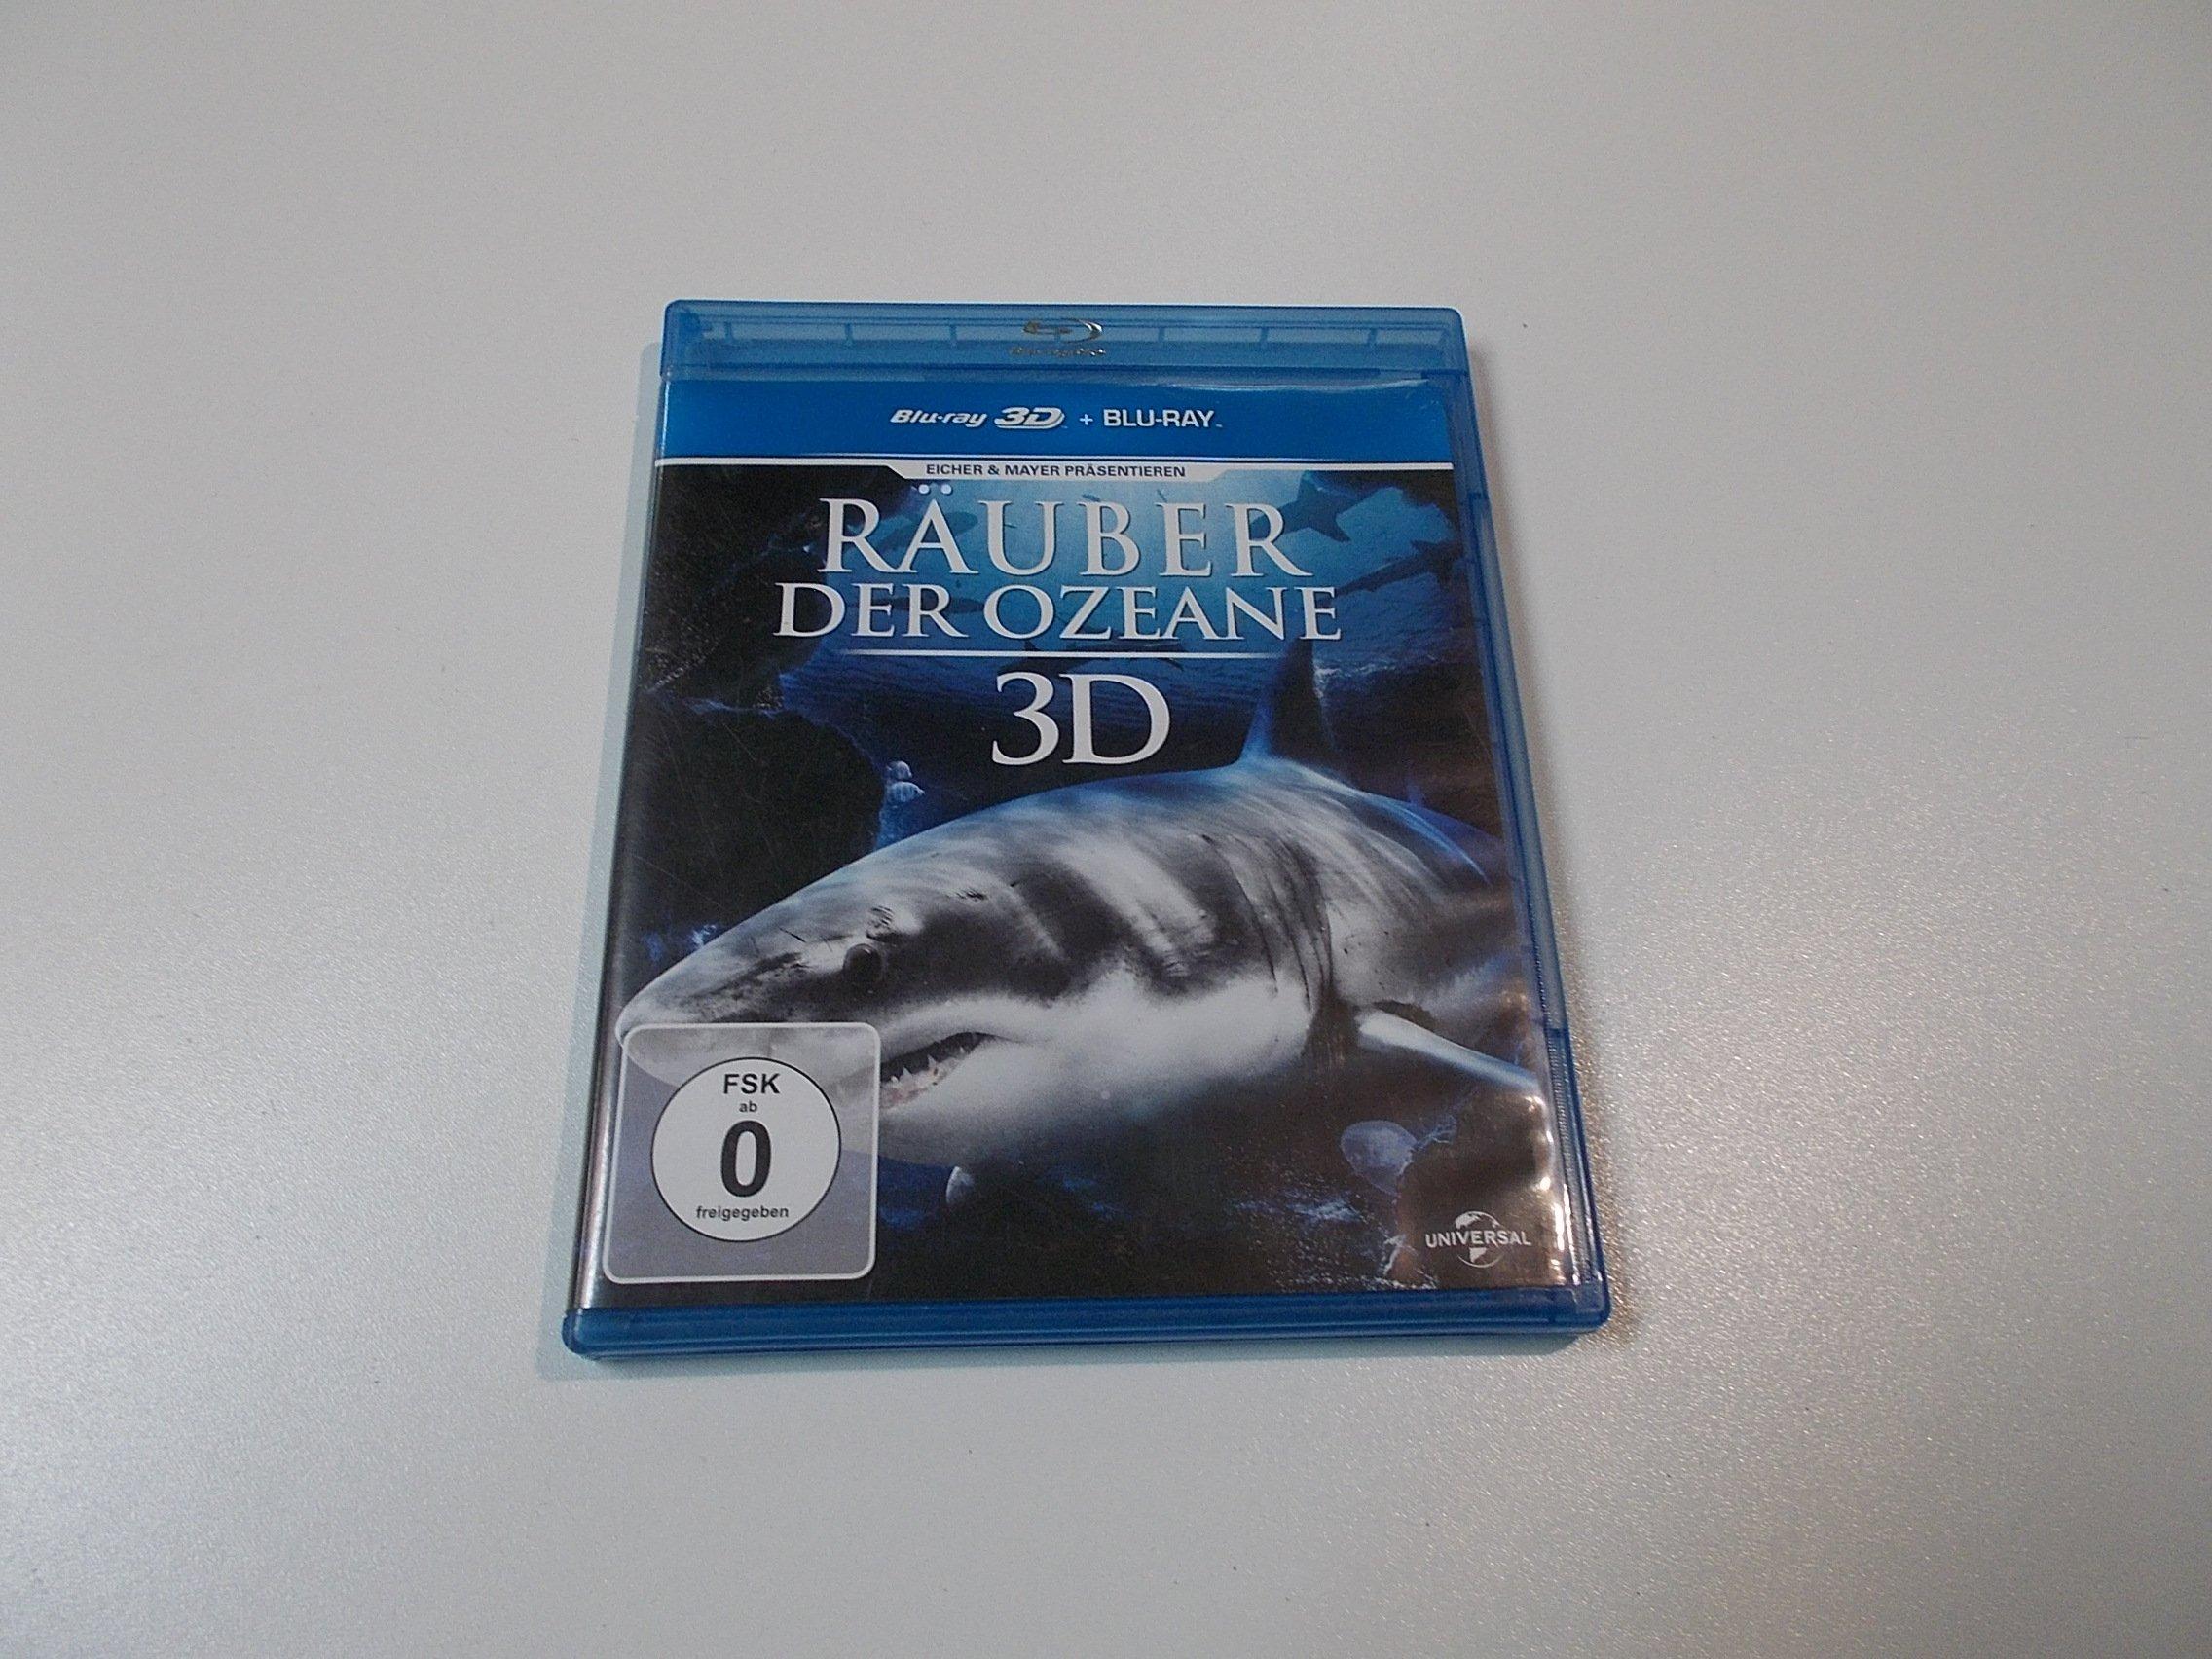 Rauber Der Ozeane  - Blu-ray 3D - Sklep